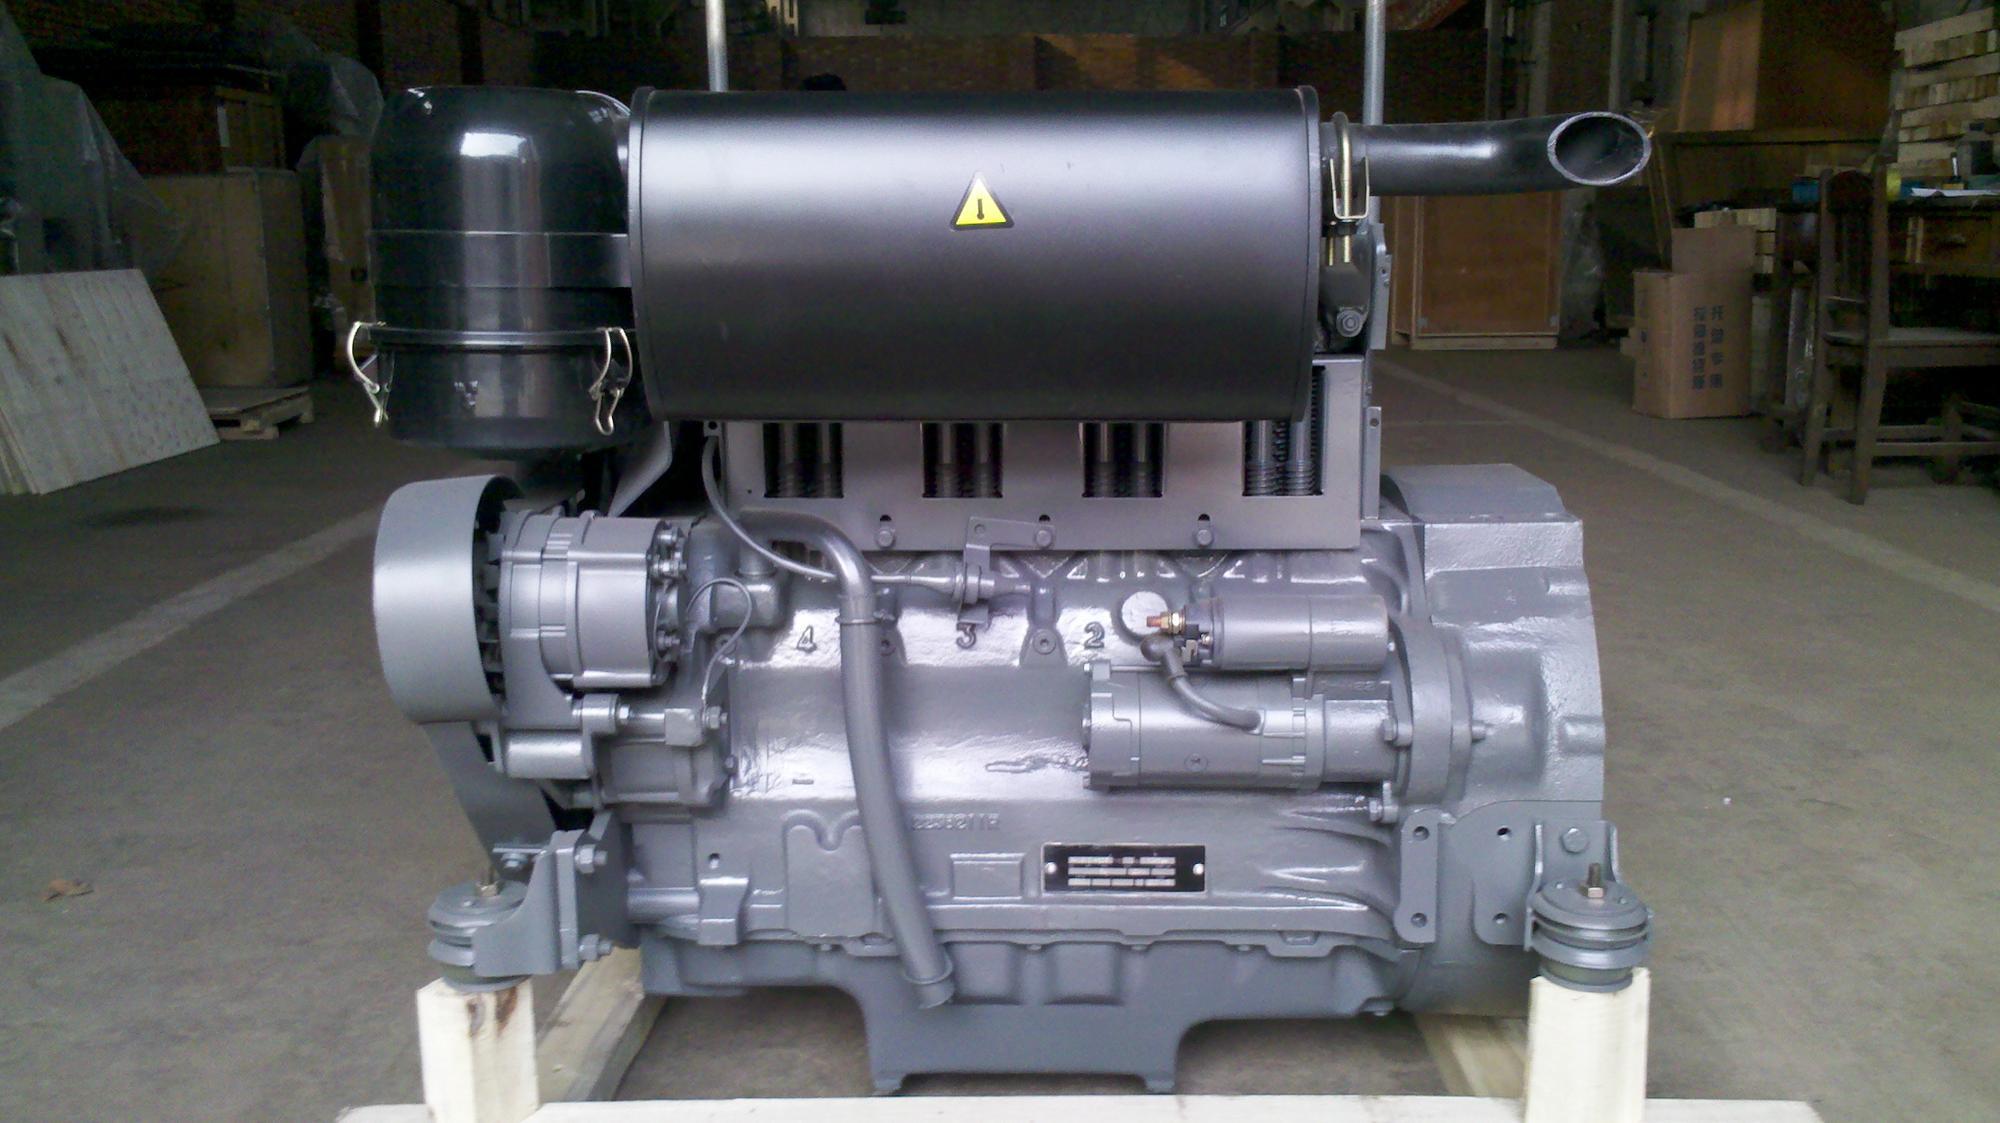 4 cylindre refroidi par air deutz diesel moteur f4l912. Black Bedroom Furniture Sets. Home Design Ideas